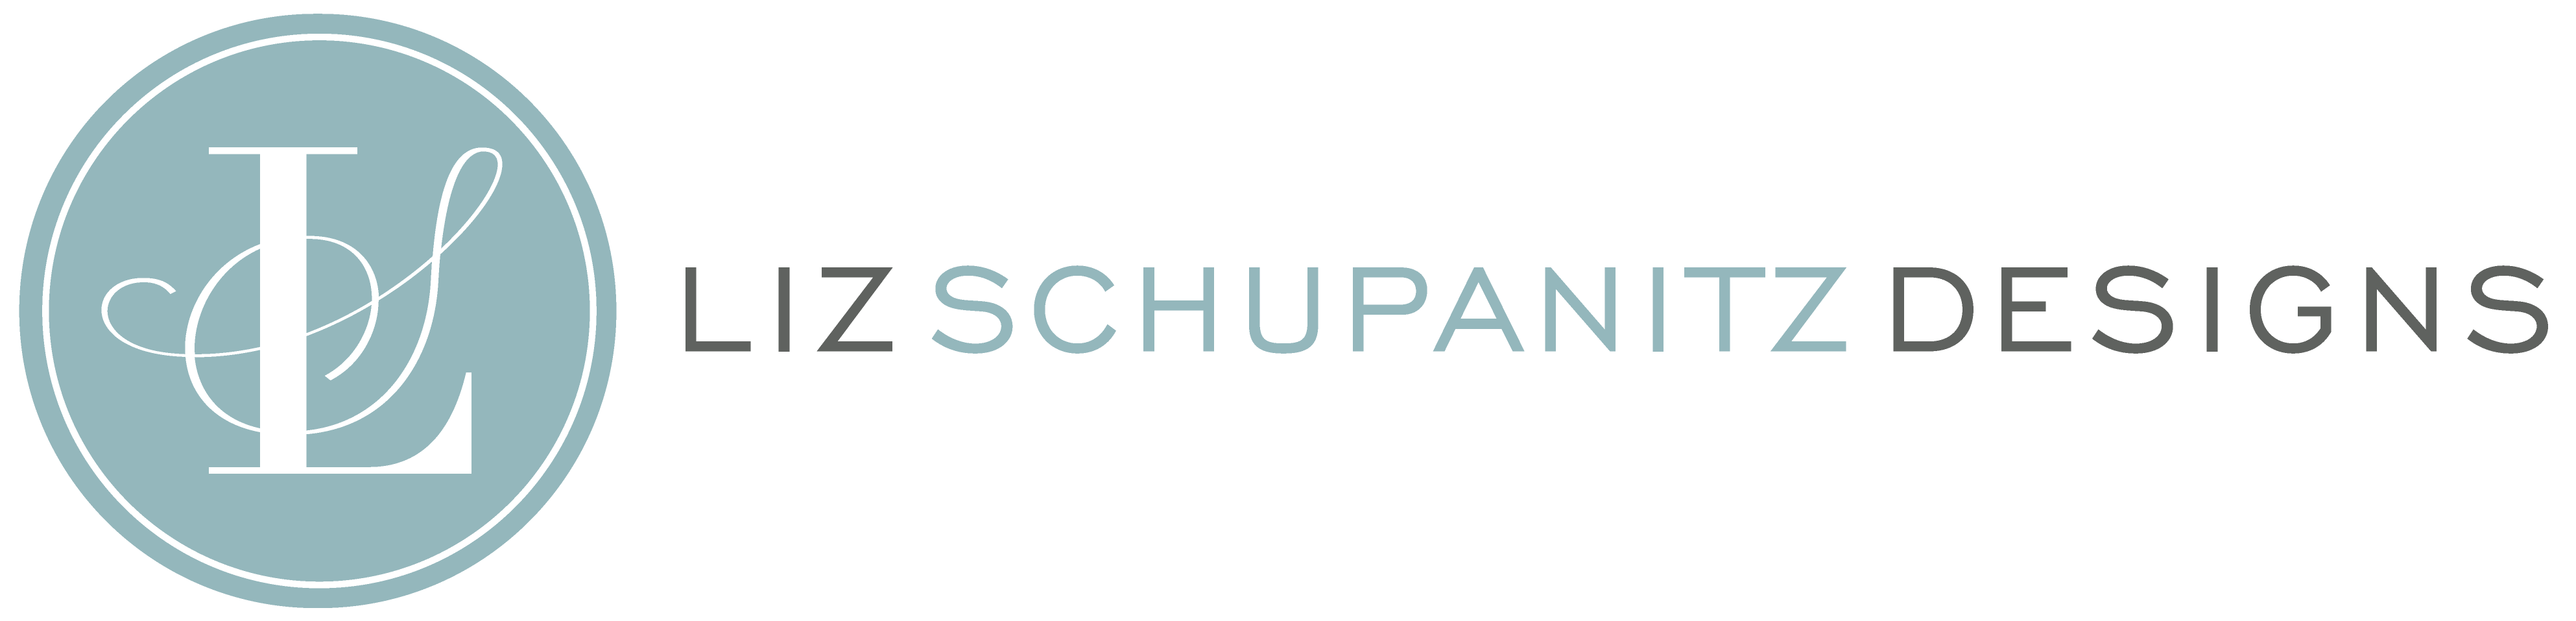 Liz Schupanitz Designs